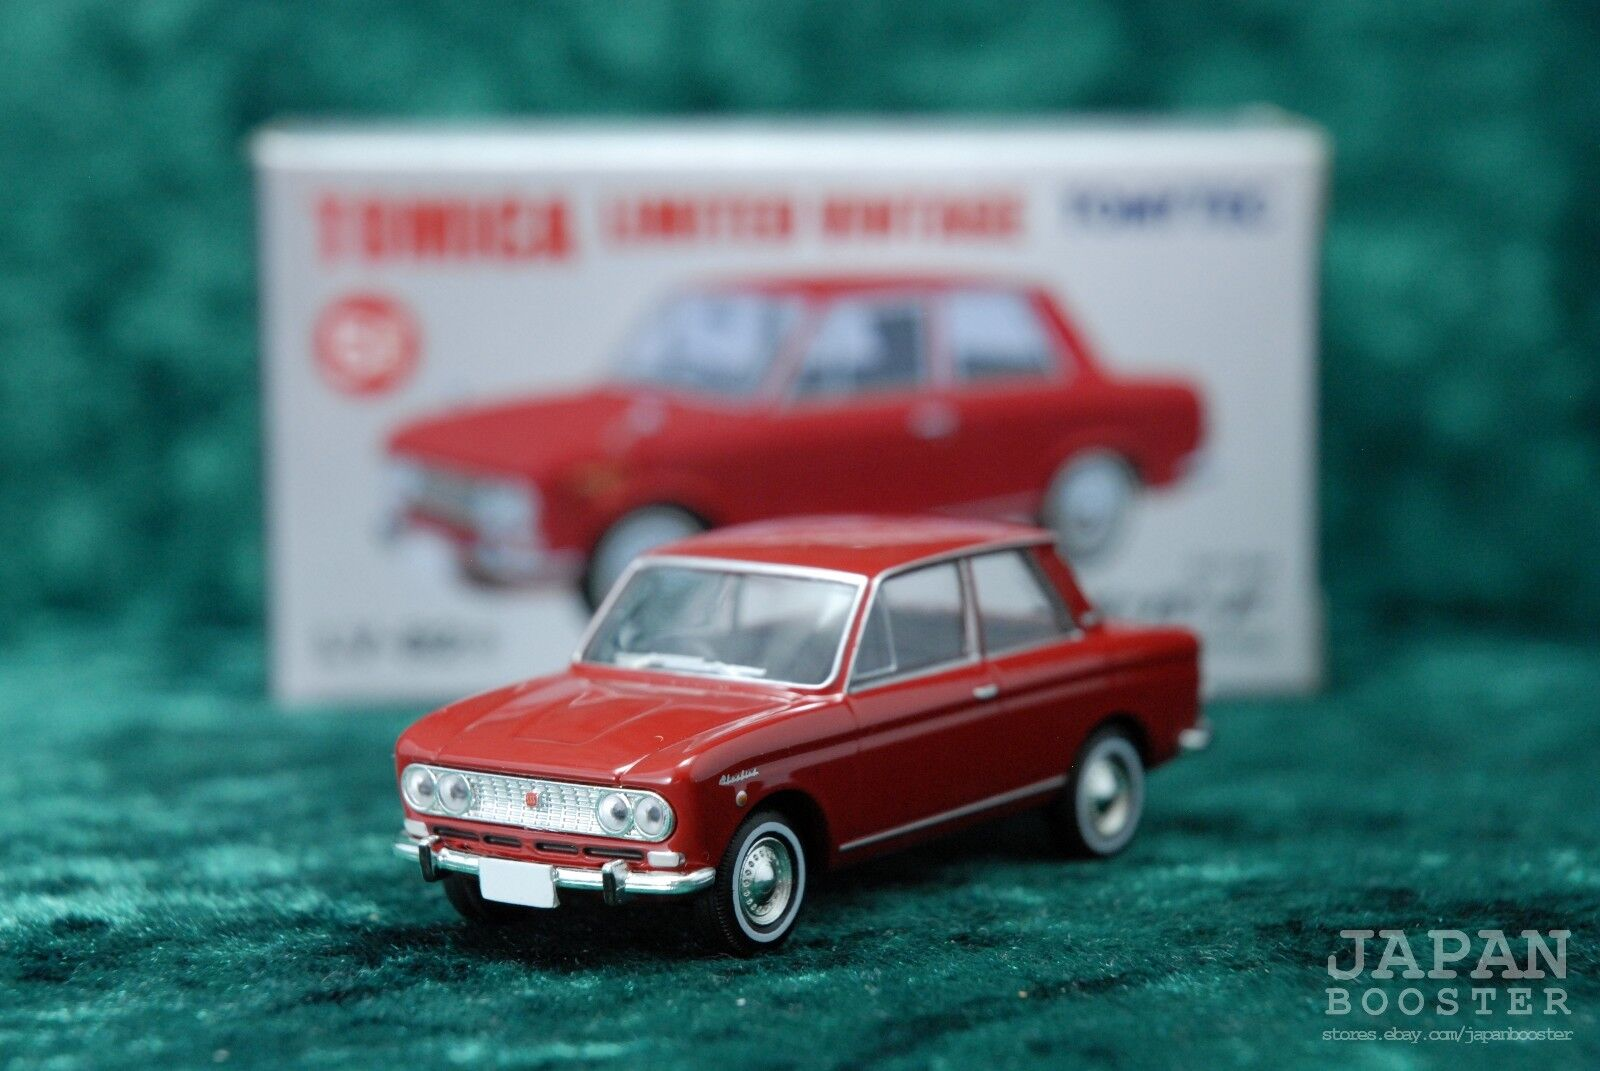 Tomica Limited Vintage Datsun Bluebird 2 Door Sedan 1600sss For Sale Online Ebay